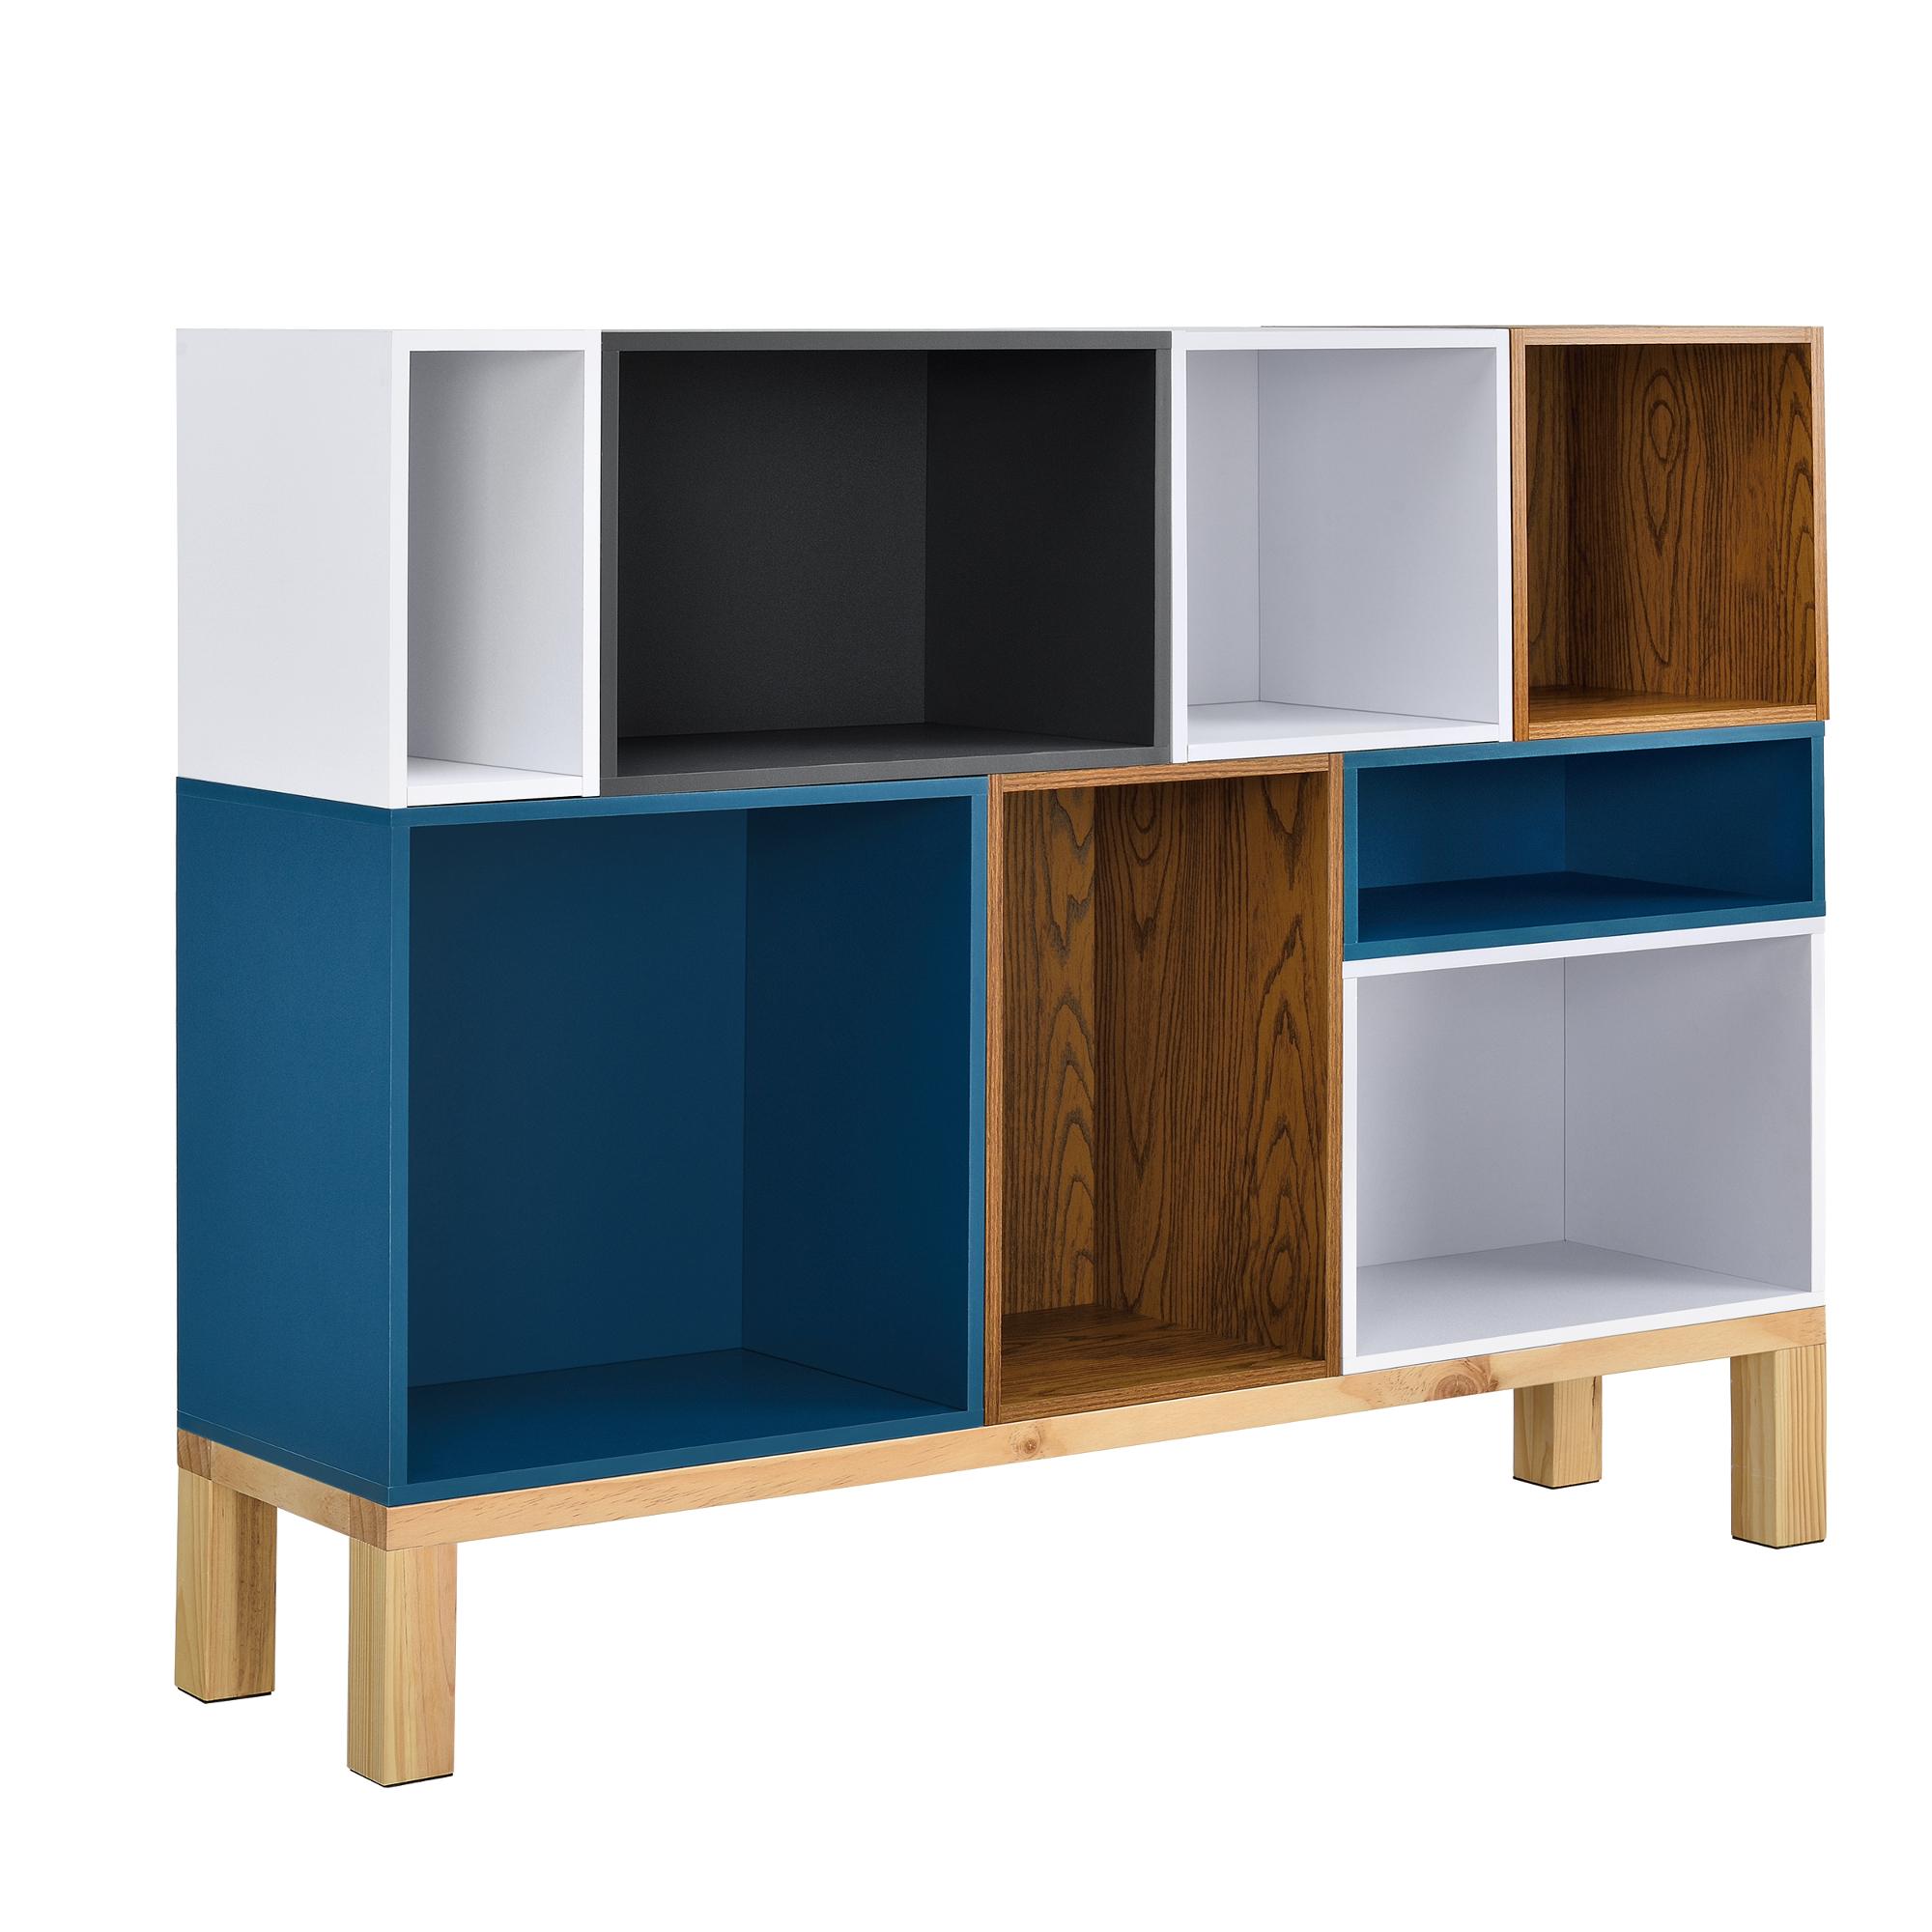 regal 60x15x15cm wei wandregal h ngeregal b cherregal kombinierbar ebay. Black Bedroom Furniture Sets. Home Design Ideas